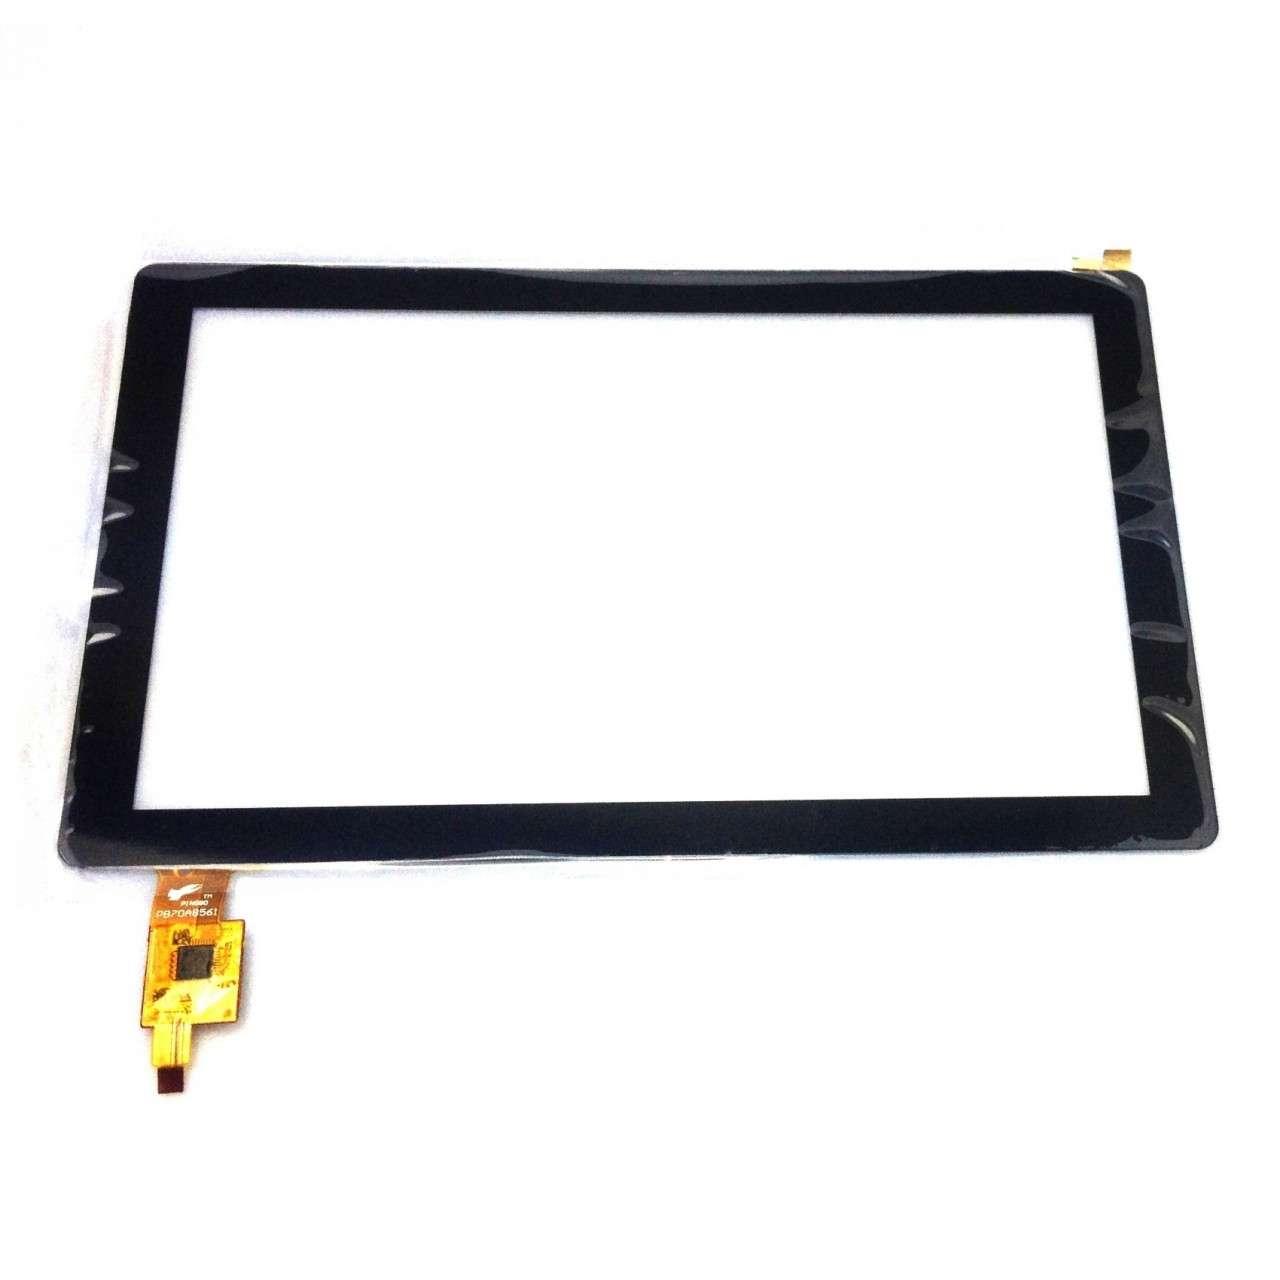 Touchscreen Digitizer Grundig GTB 701 Geam Sticla Tableta imagine powerlaptop.ro 2021